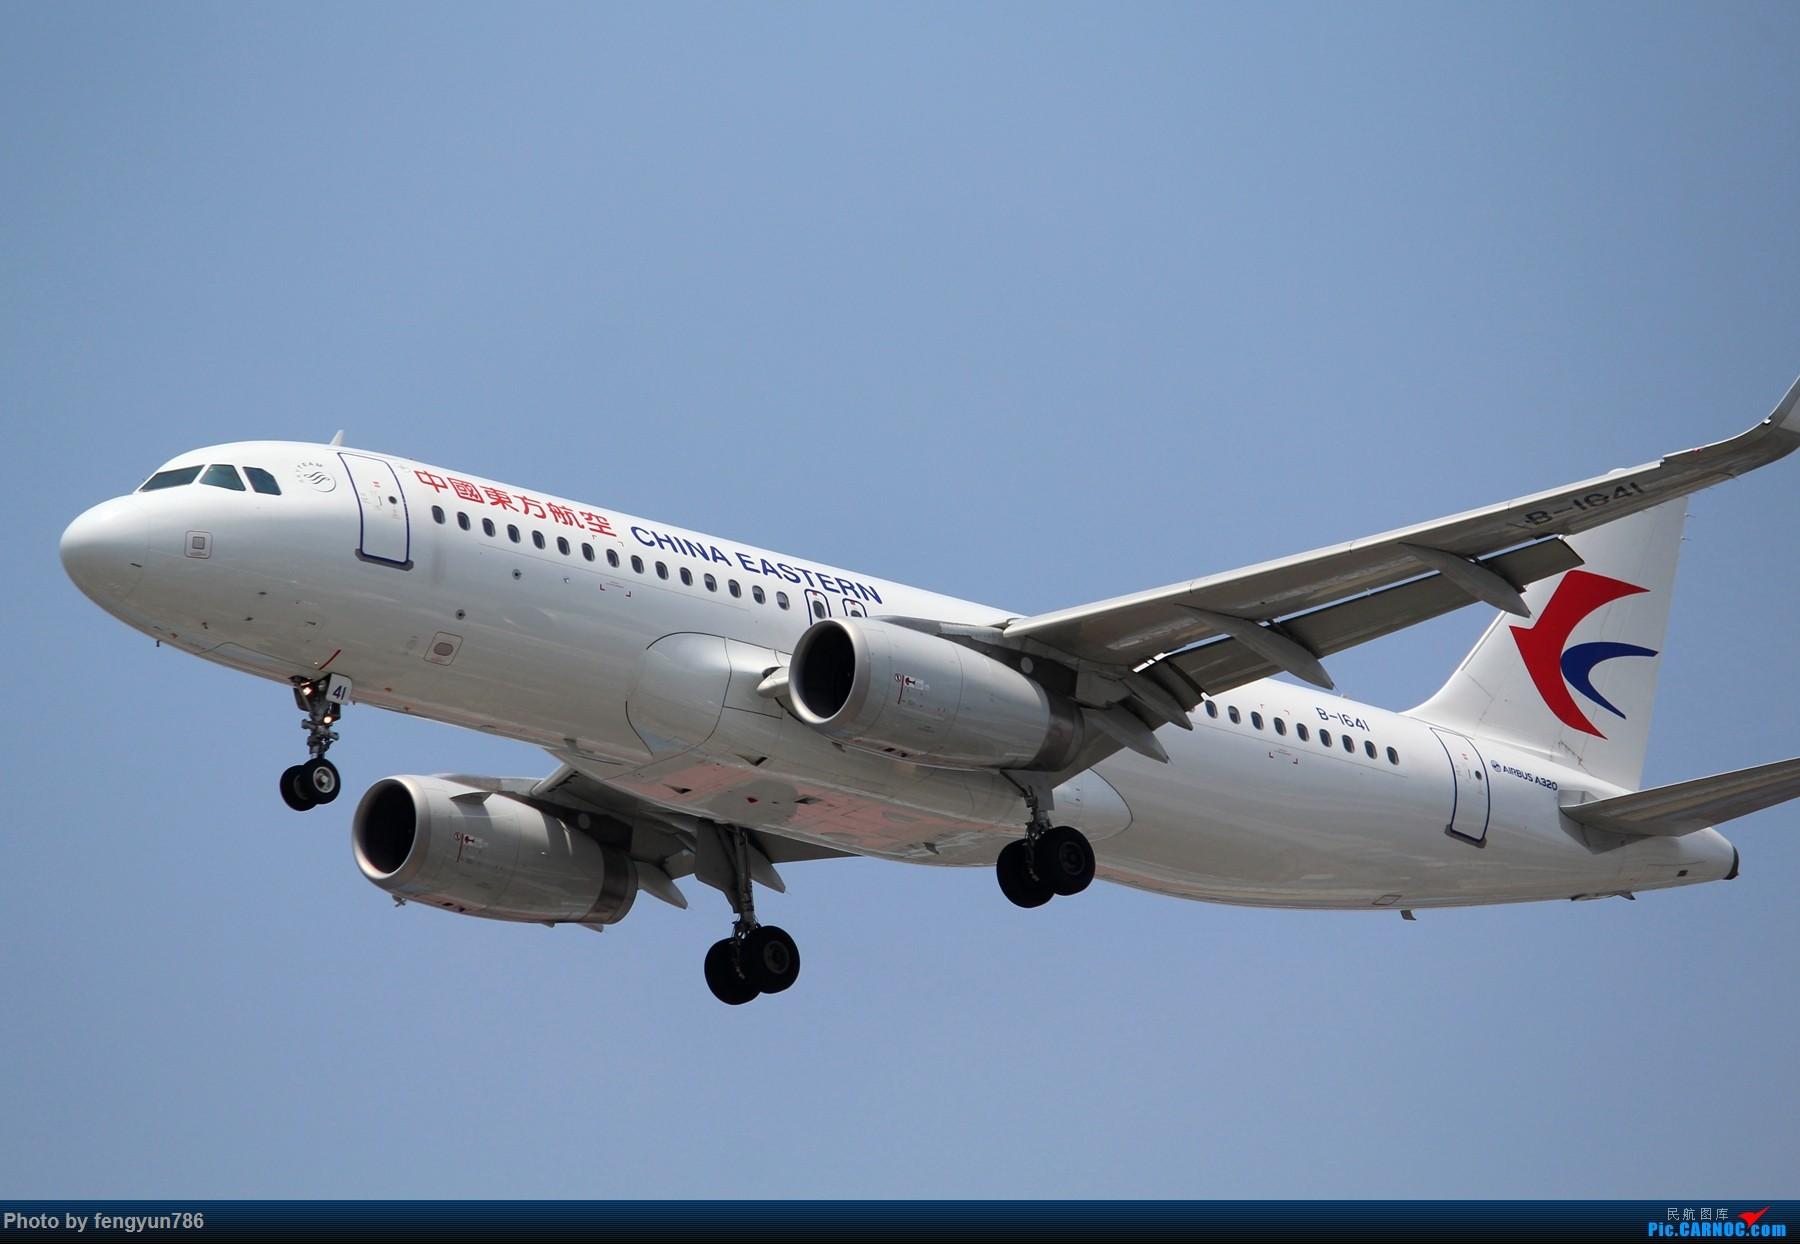 Re:[原创]7.19的SHA,天晴温高,发几个跟前一天不一样的。 AIRBUS A320-200 B-1641 中国上海虹桥国际机场